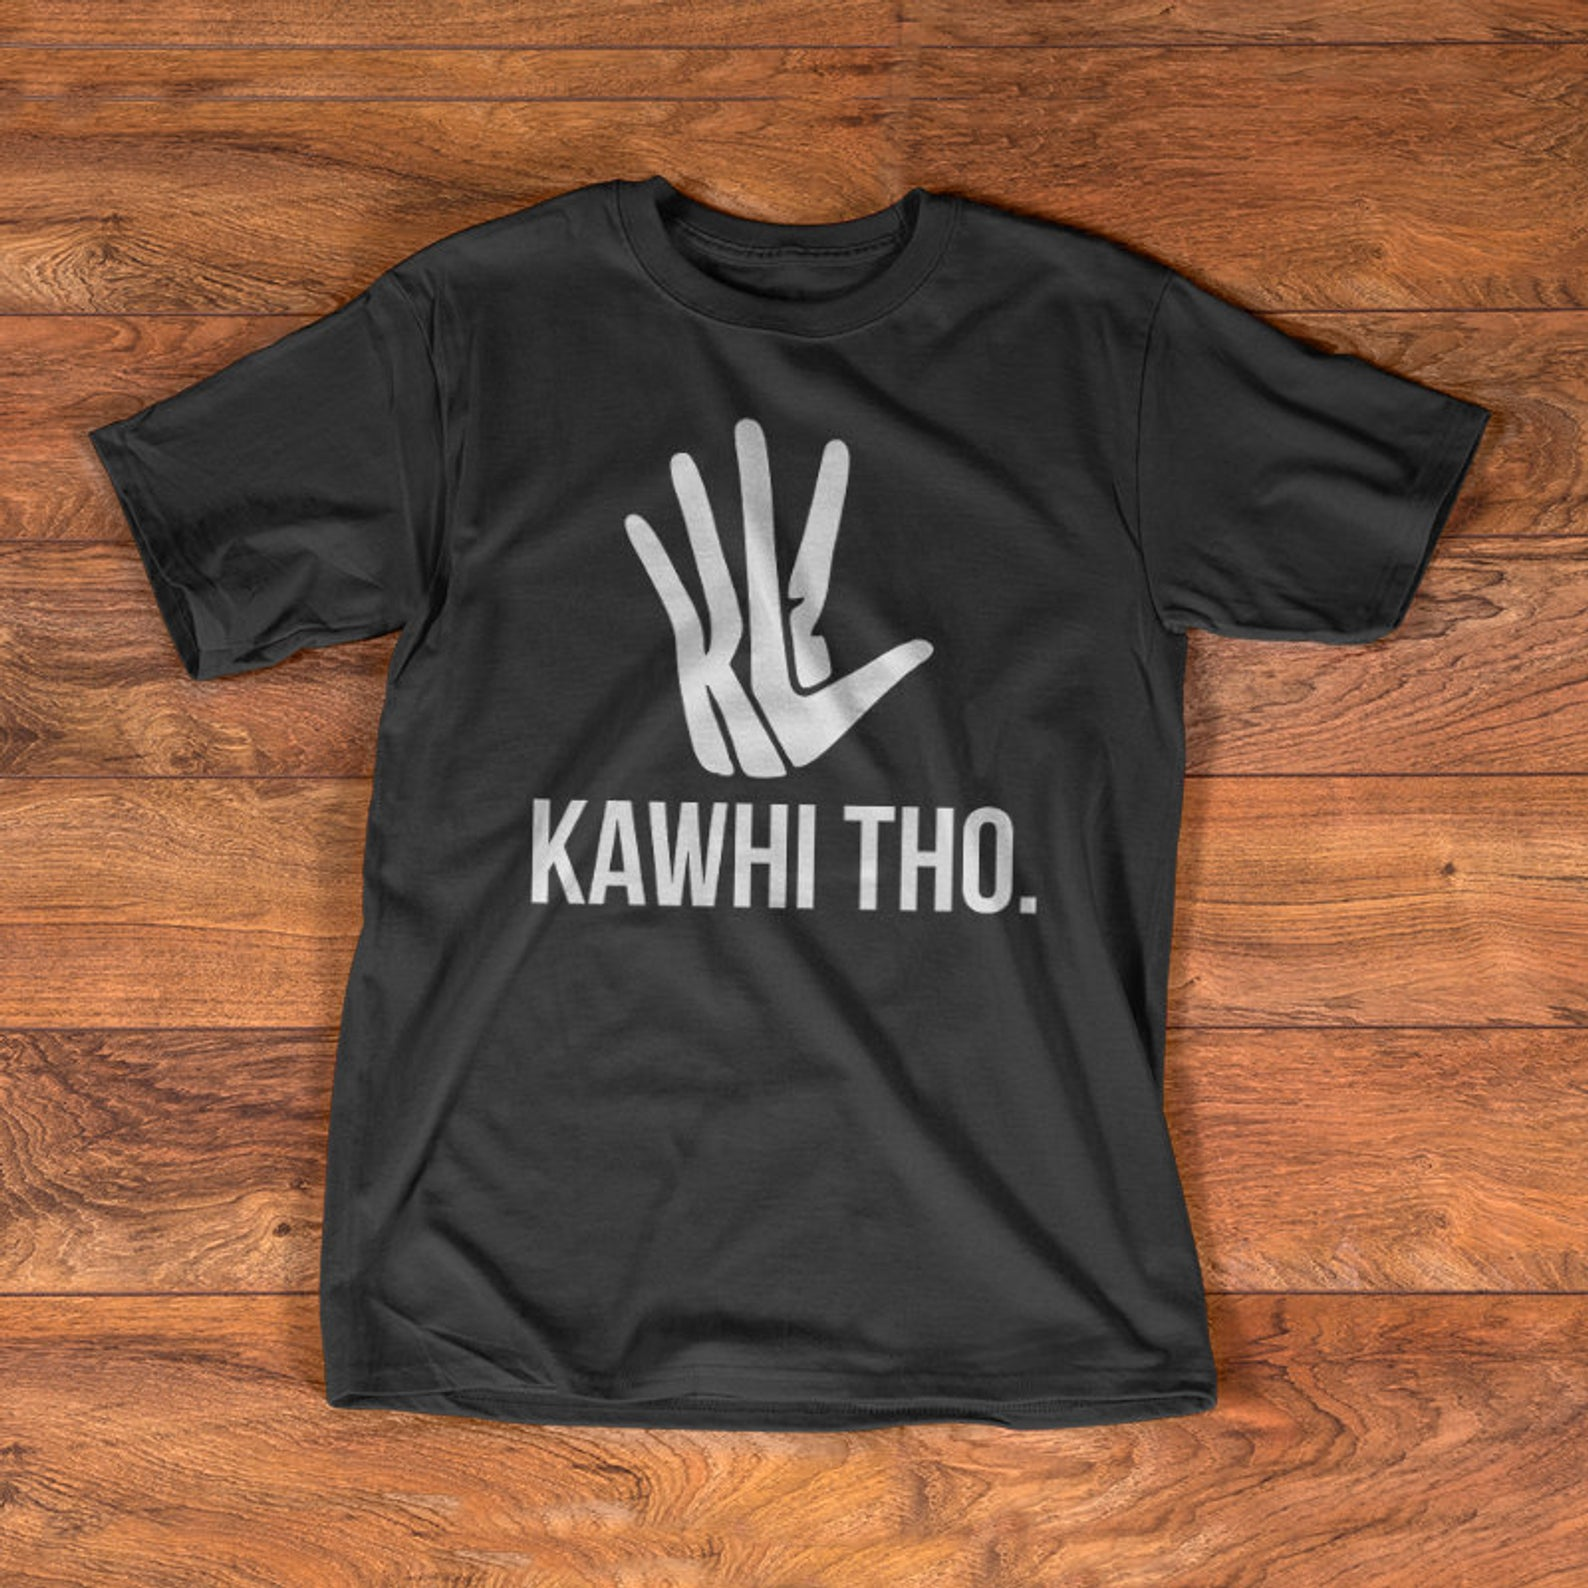 the latest 55afe 73a90 Kawhi Leonard Unisex Jersey Short Sleeve Tee Toronto Raptors Kawhi Tho NBA  Champions 2019 Shirt